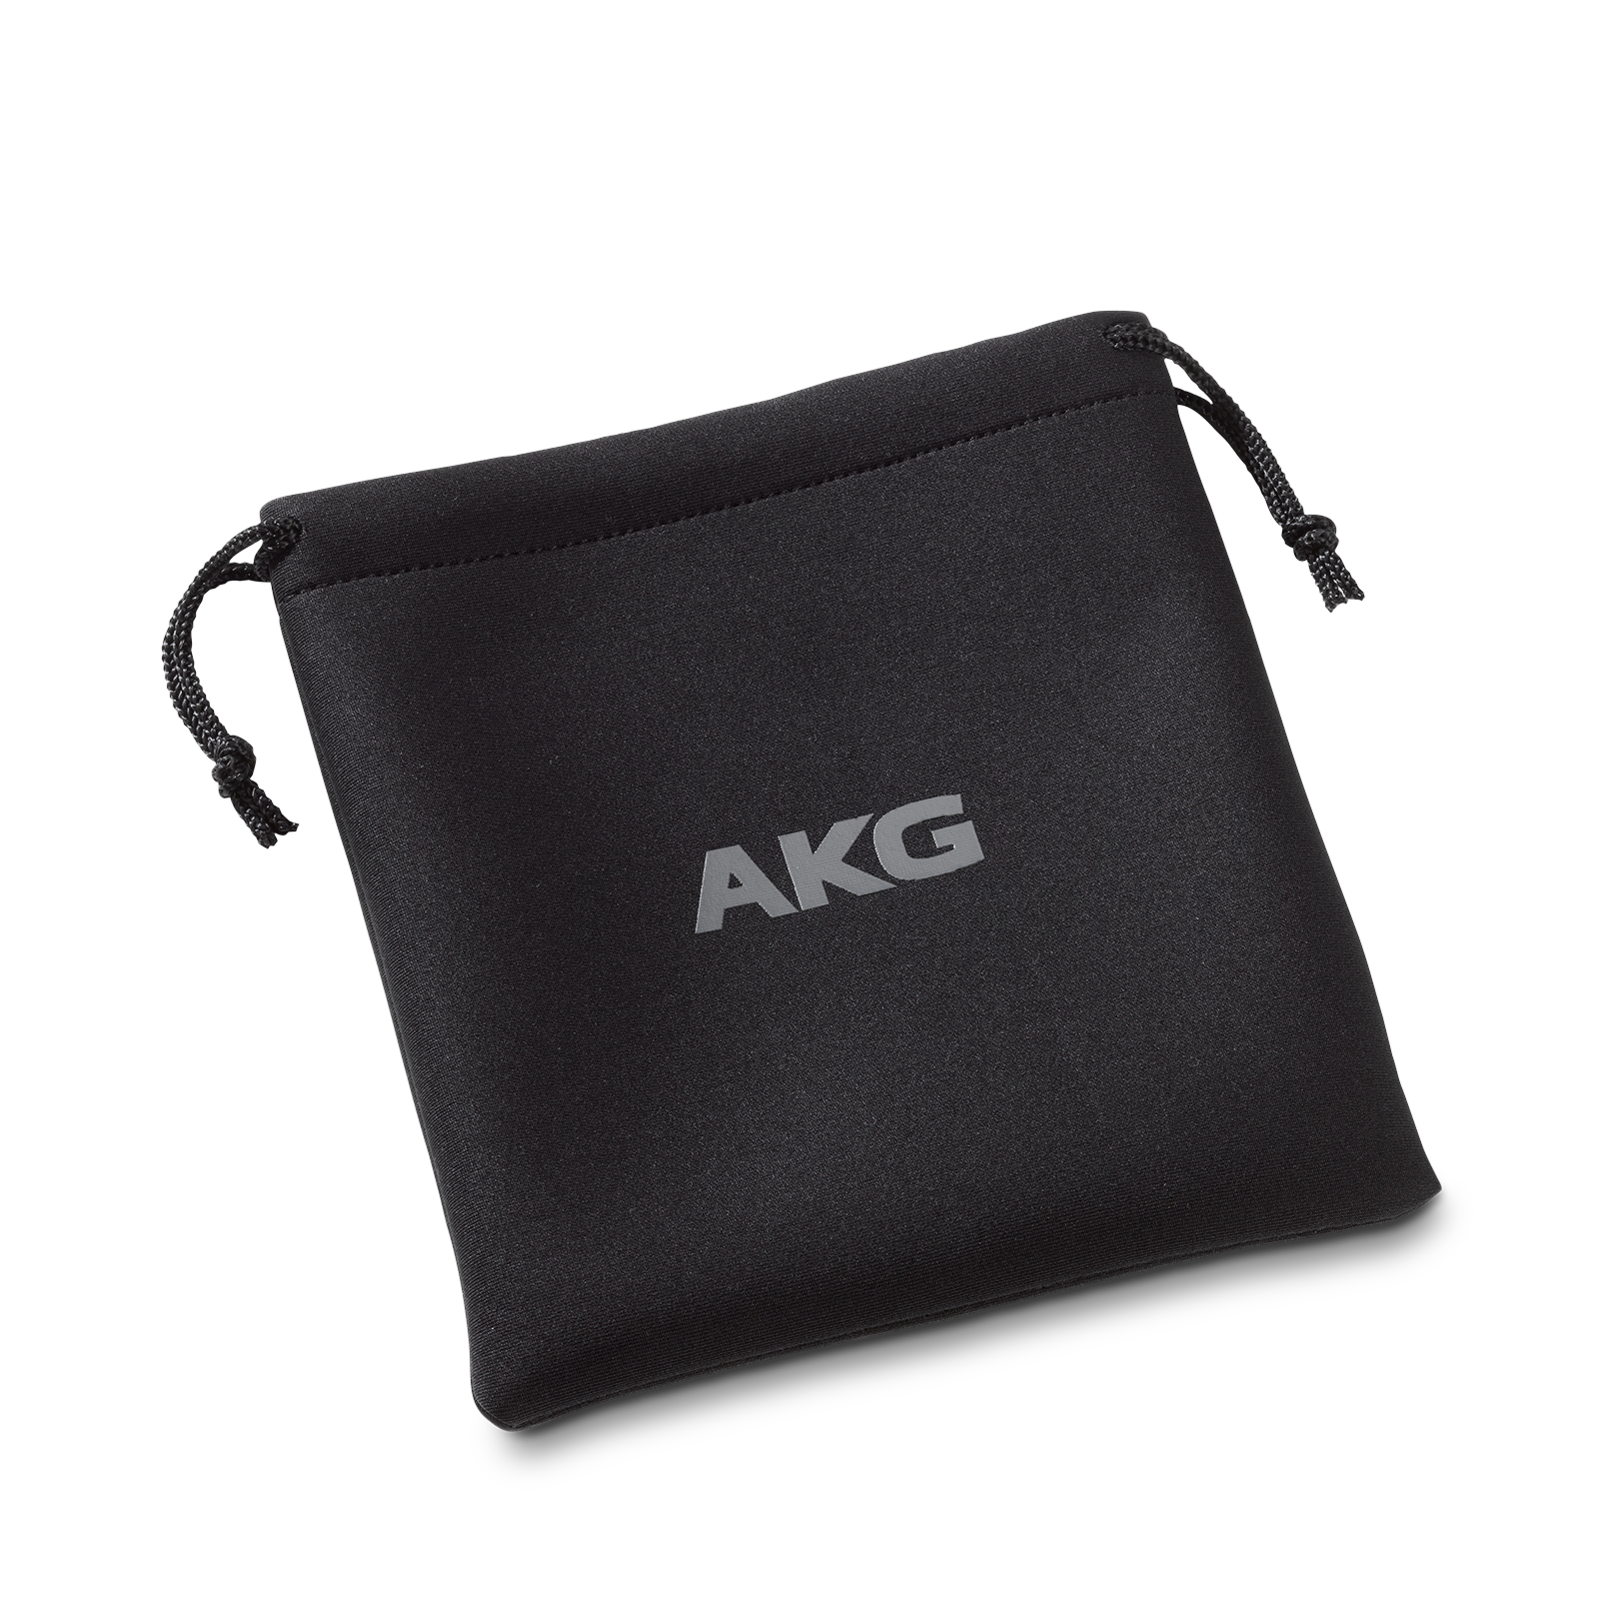 Y50BT - Black - Premium portable Bluetooth speaker with quad microphone conferencing system - Detailshot 1